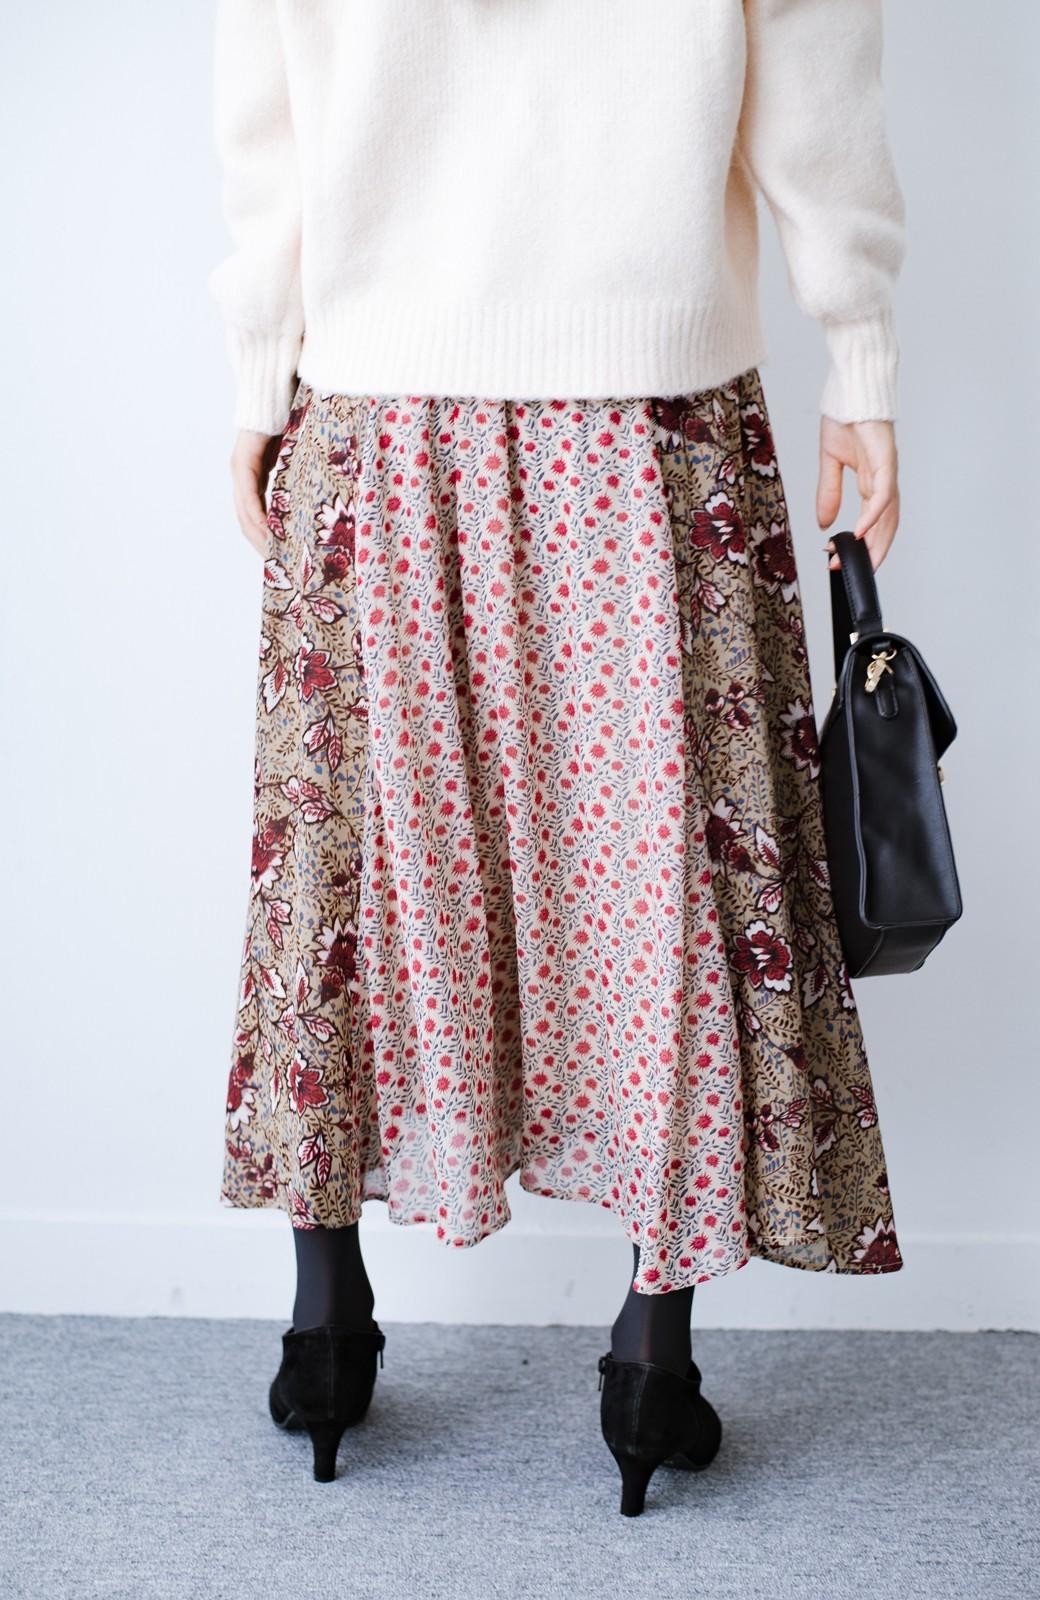 haco! 【洗濯機洗いOK】シンプルなトップスに合わせるだけでかわいくなれる MIX柄スカート <ベージュ系その他>の商品写真5